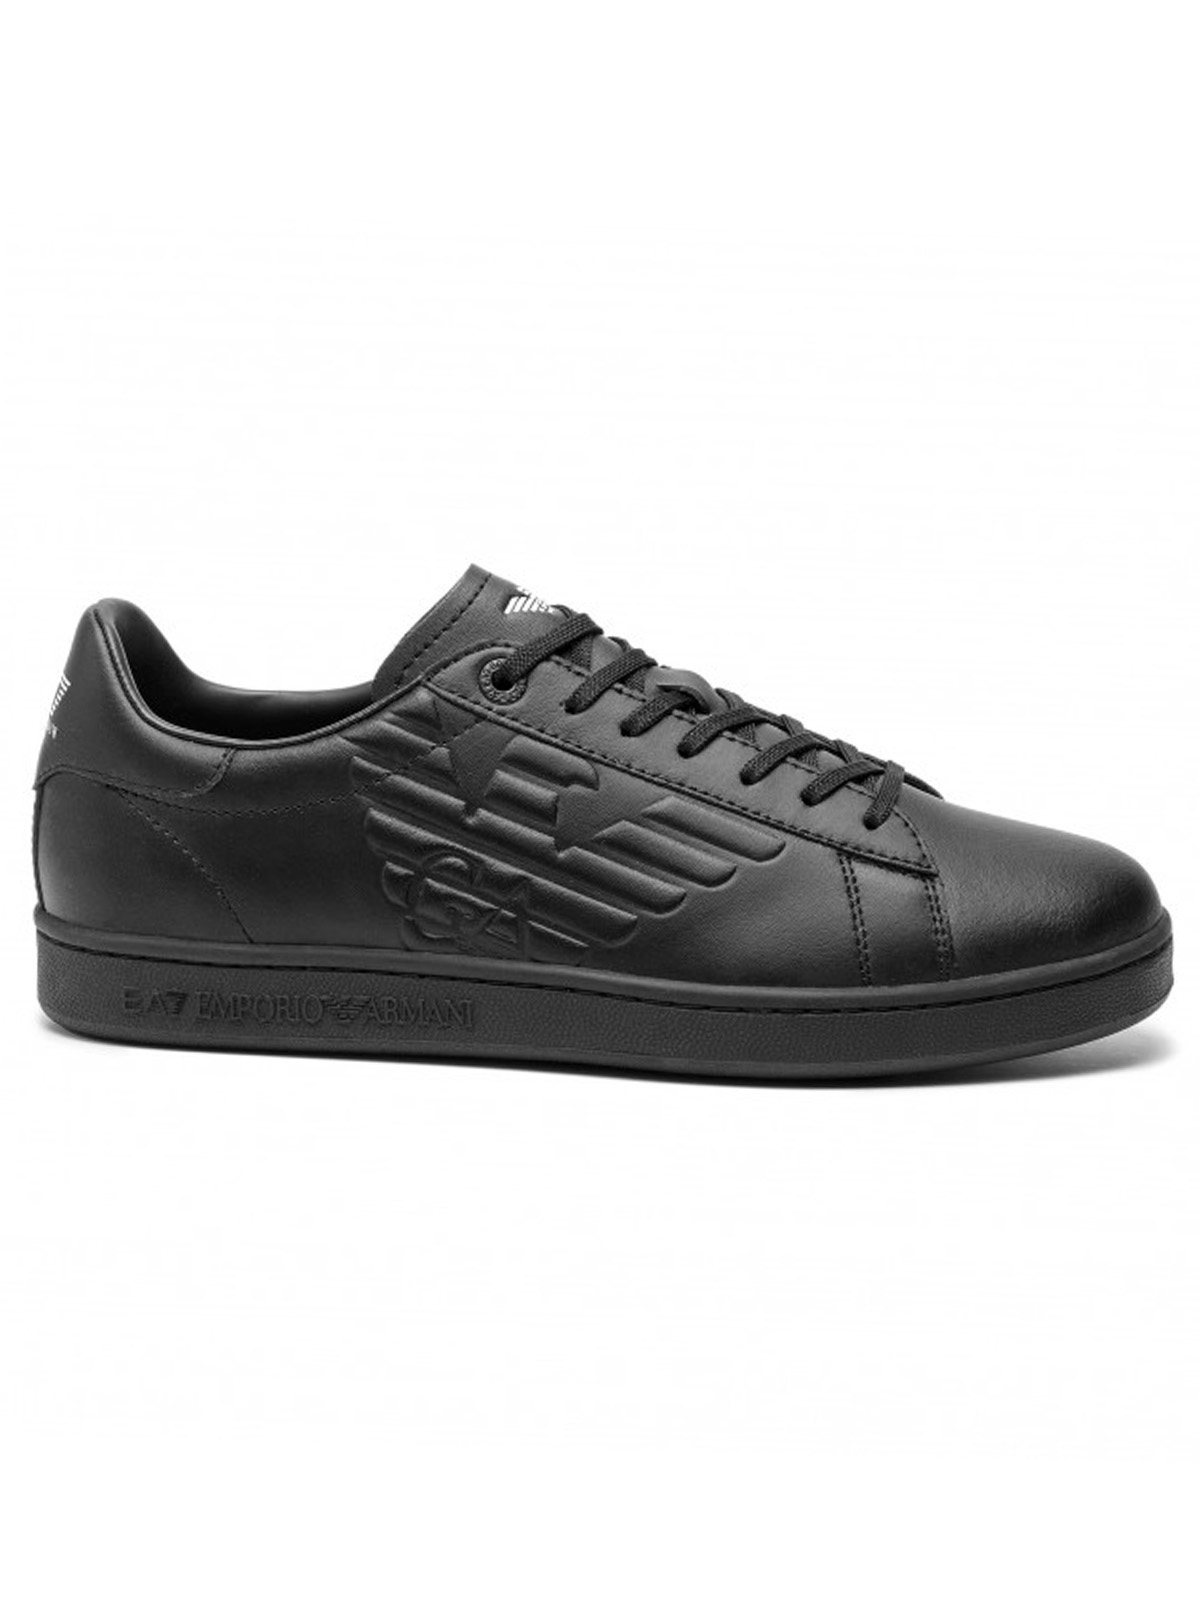 emporio armani shoes sneakers, OFF 76%,Buy!